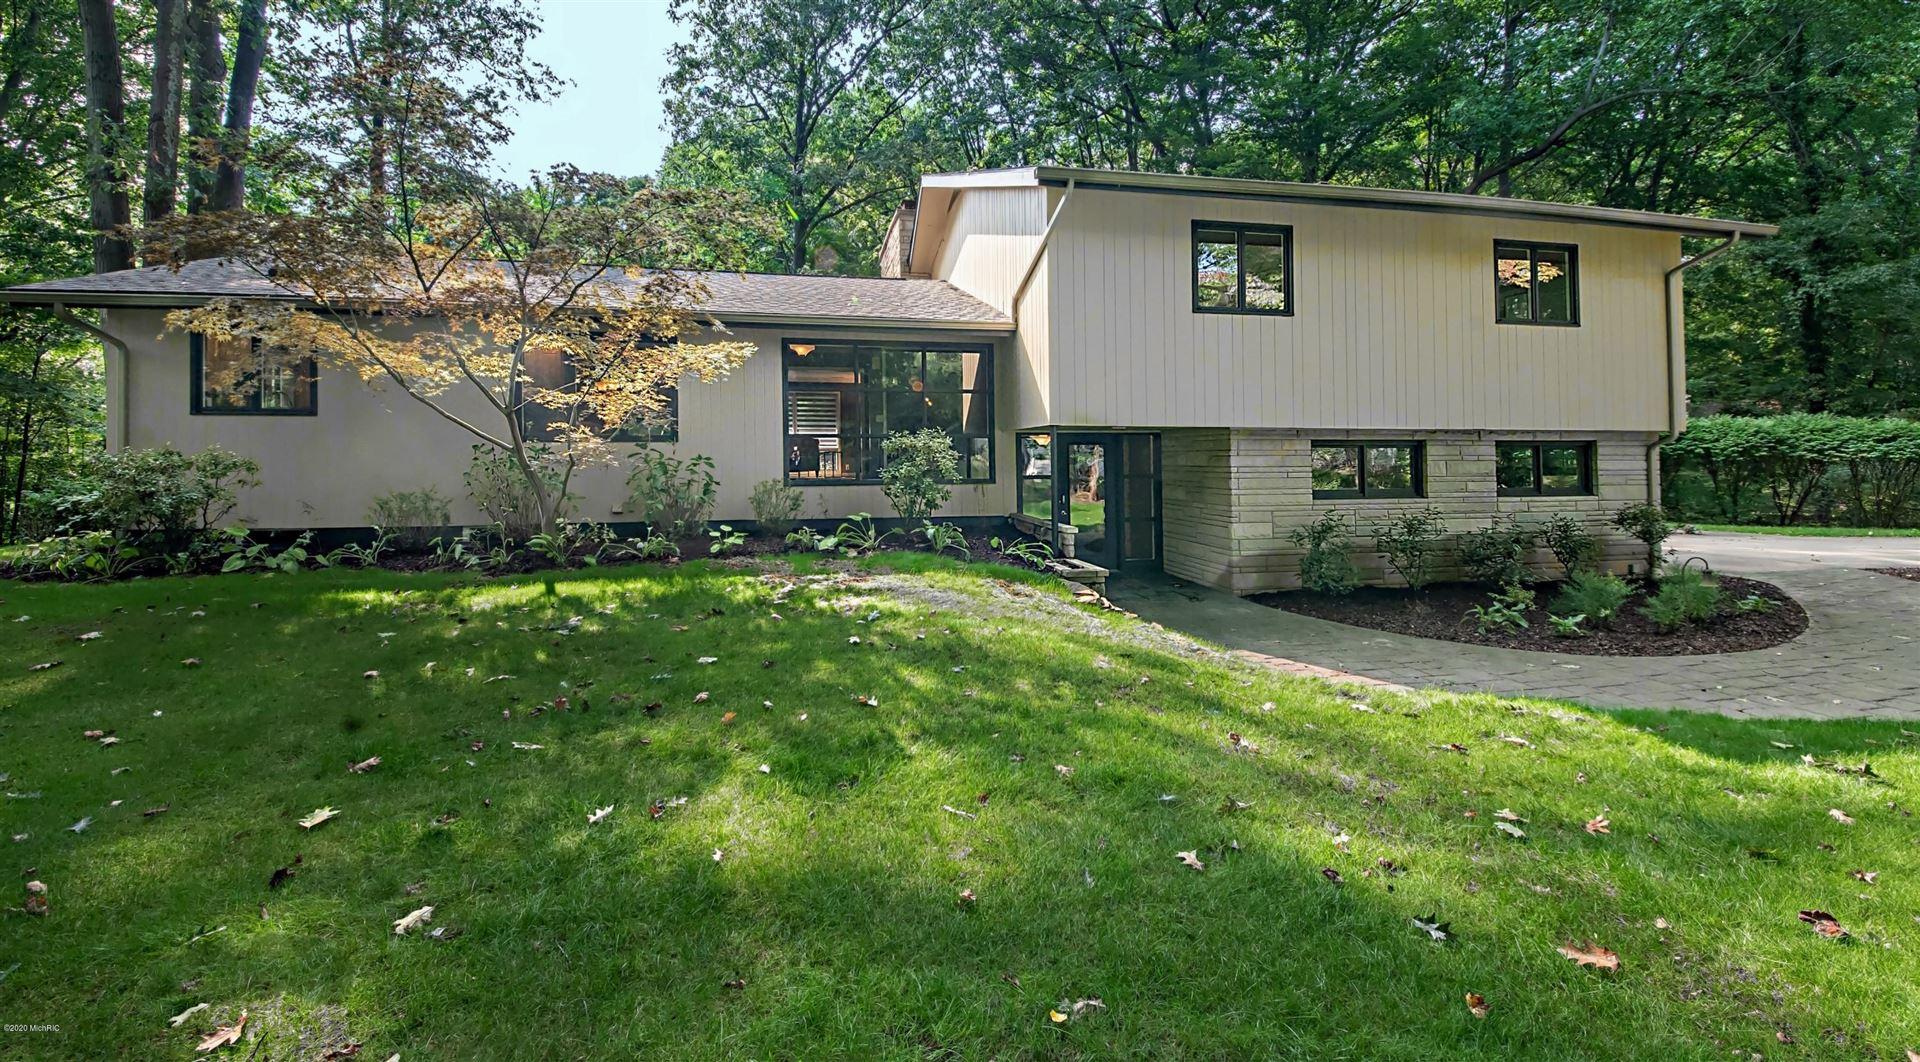 1355 Point O Woods Drive, Benton Harbor, MI 49022 - MLS#: 21005789